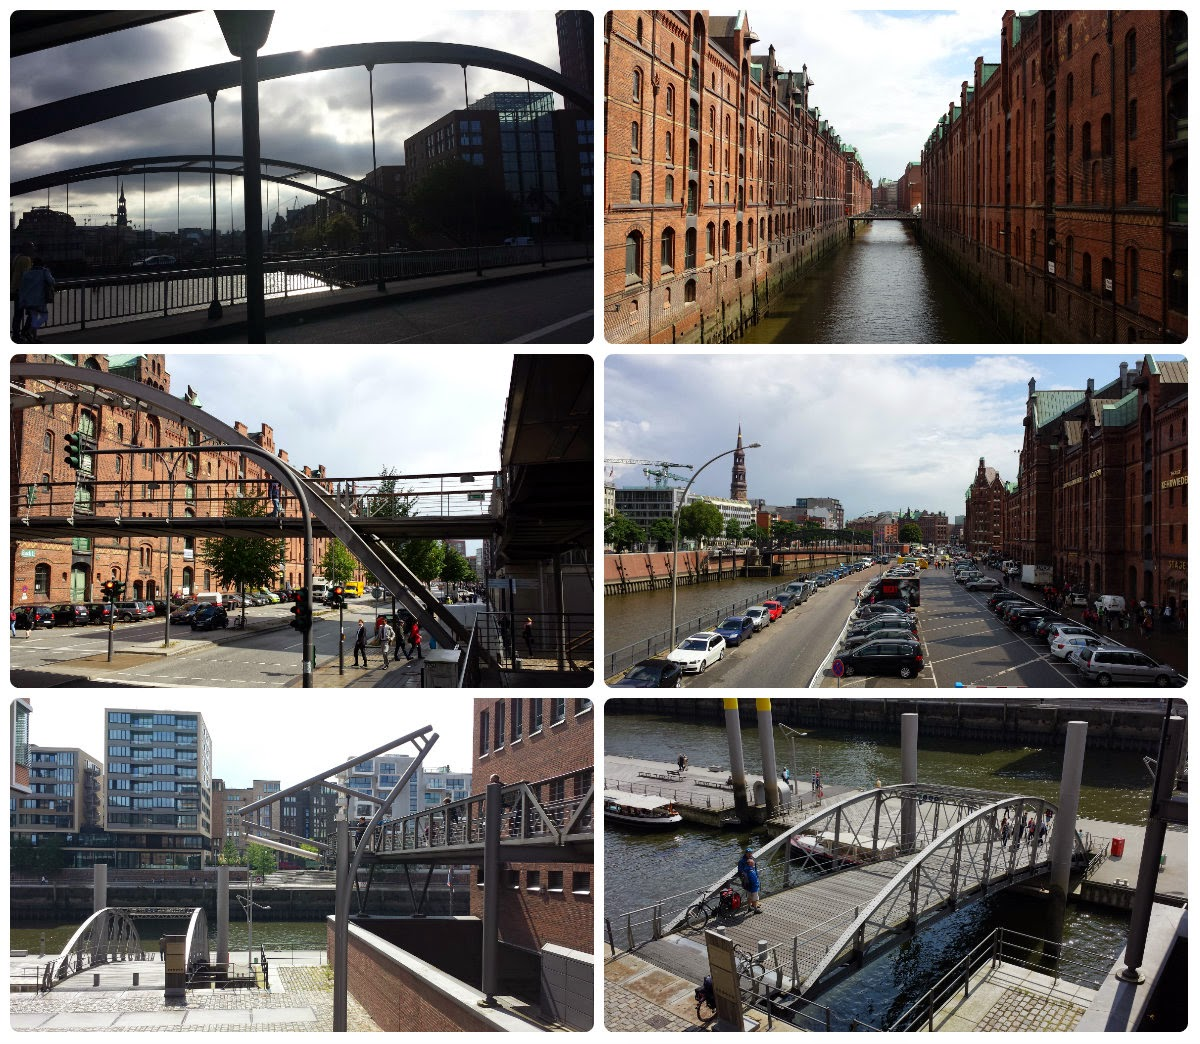 Wyjazd do Hamburga